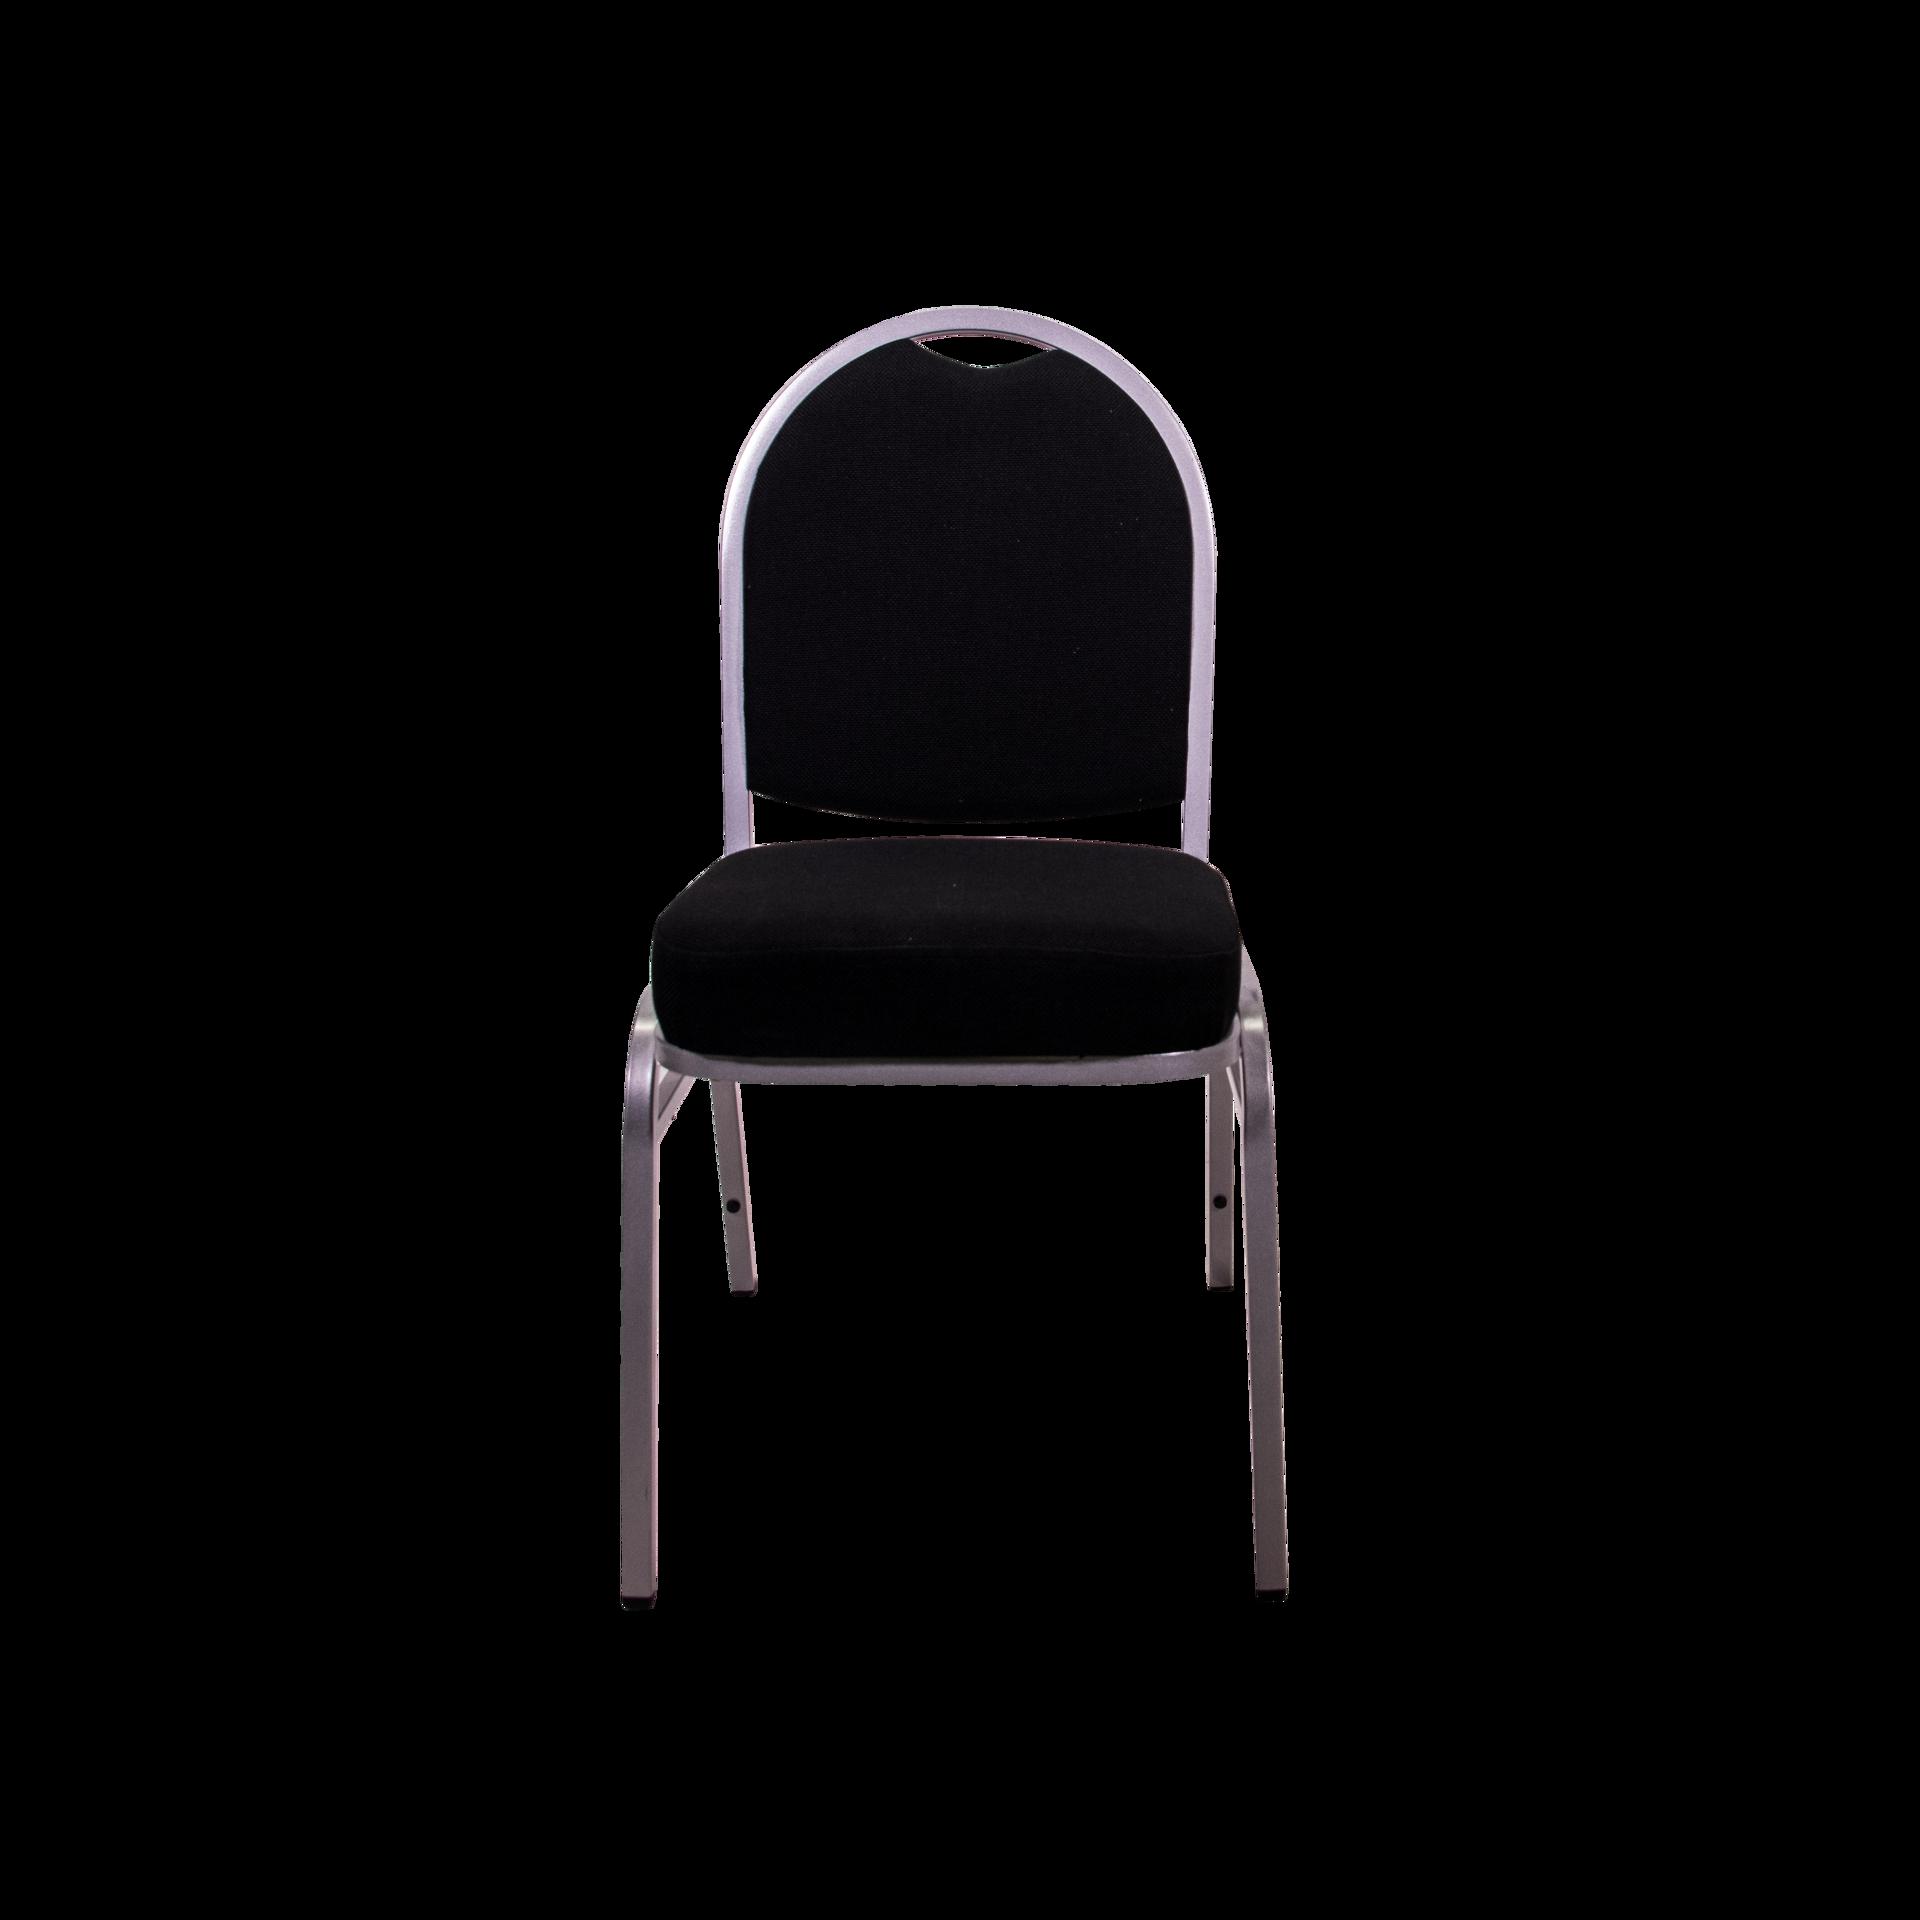 Image Banquet Chair - Black